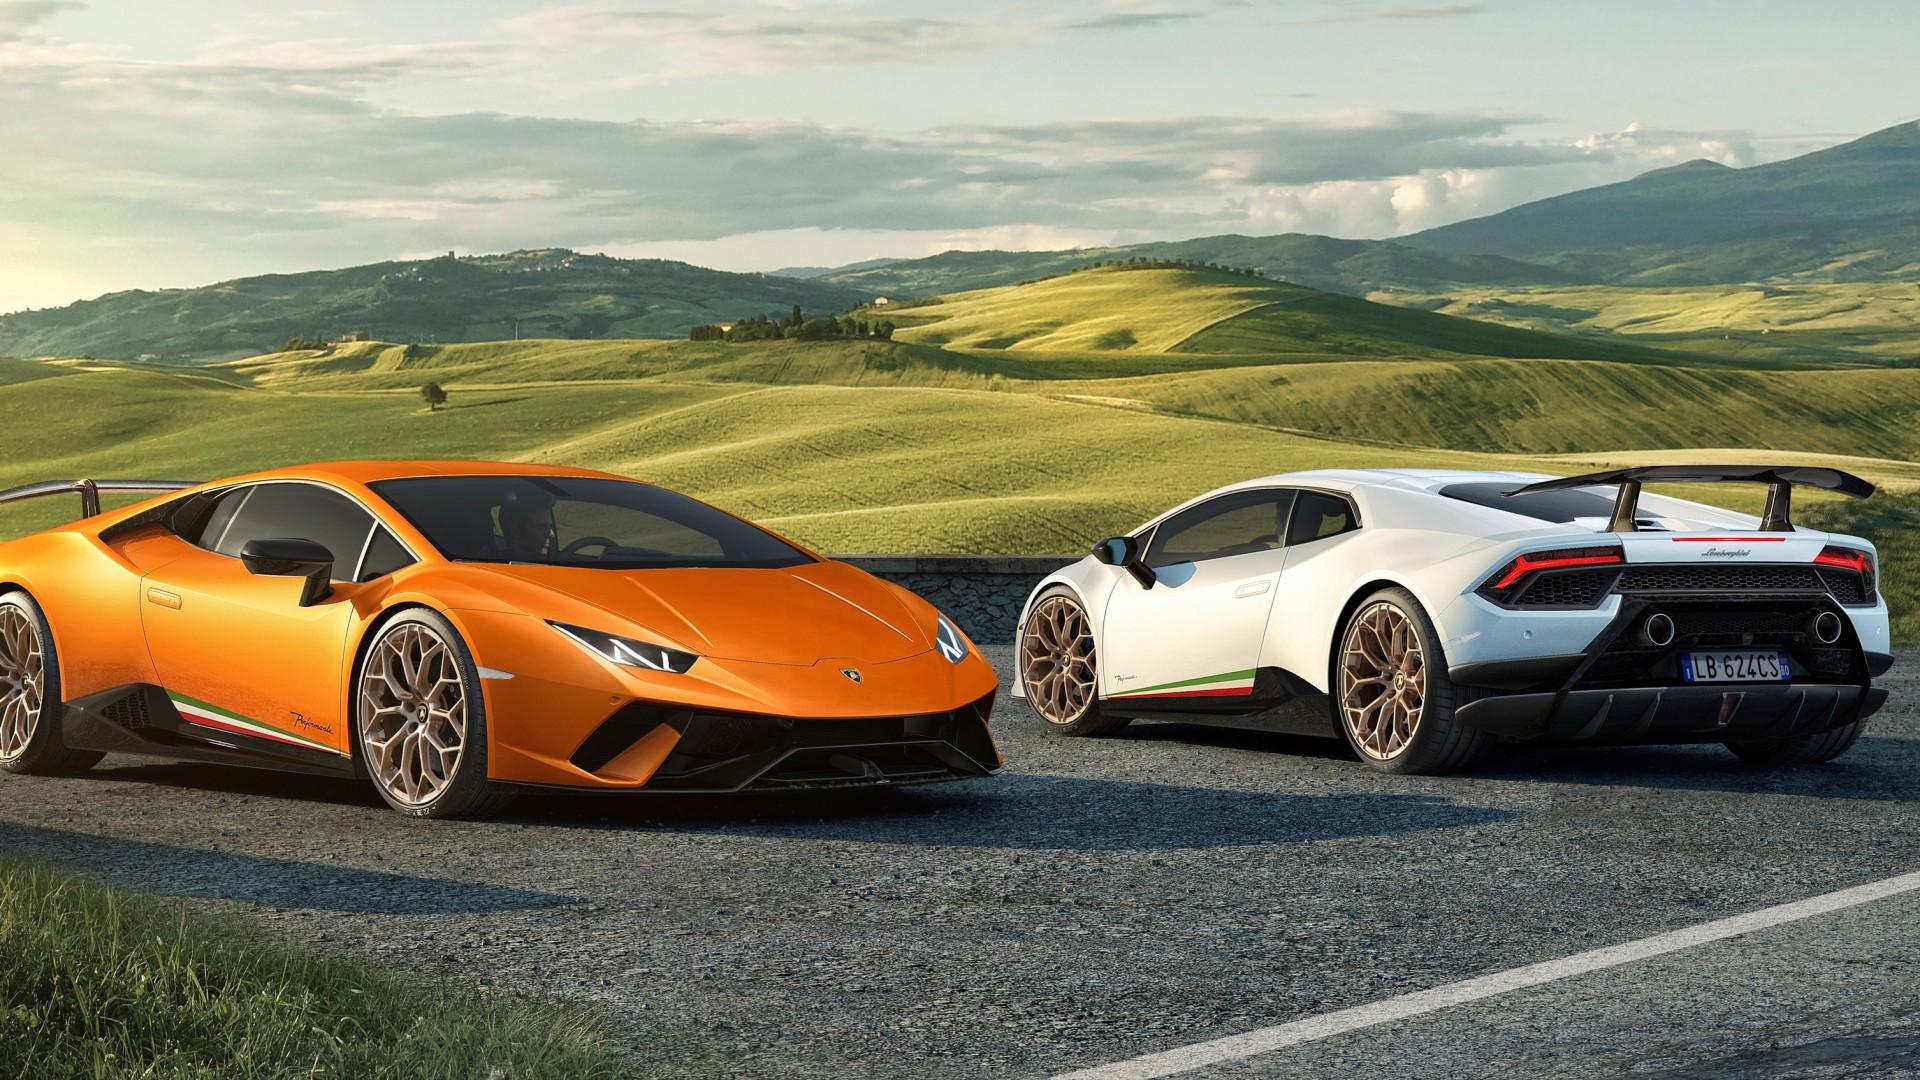 2017 Lamborghini Huracan Performante 3 Wallpaper | HD Car ...